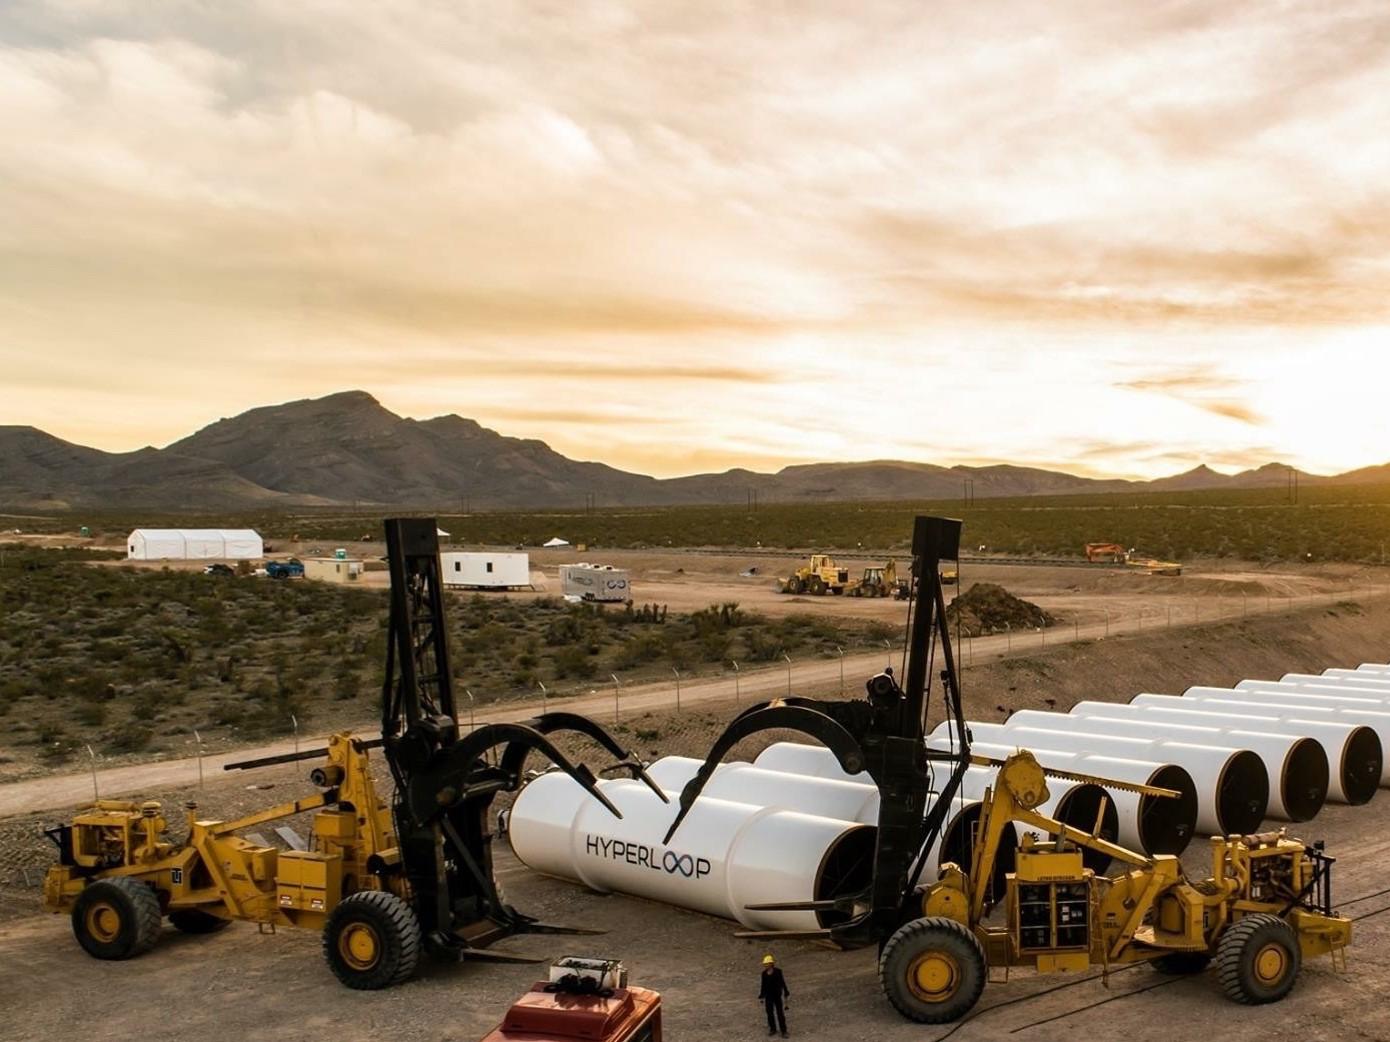 Construction on a test hyperloop track begins.